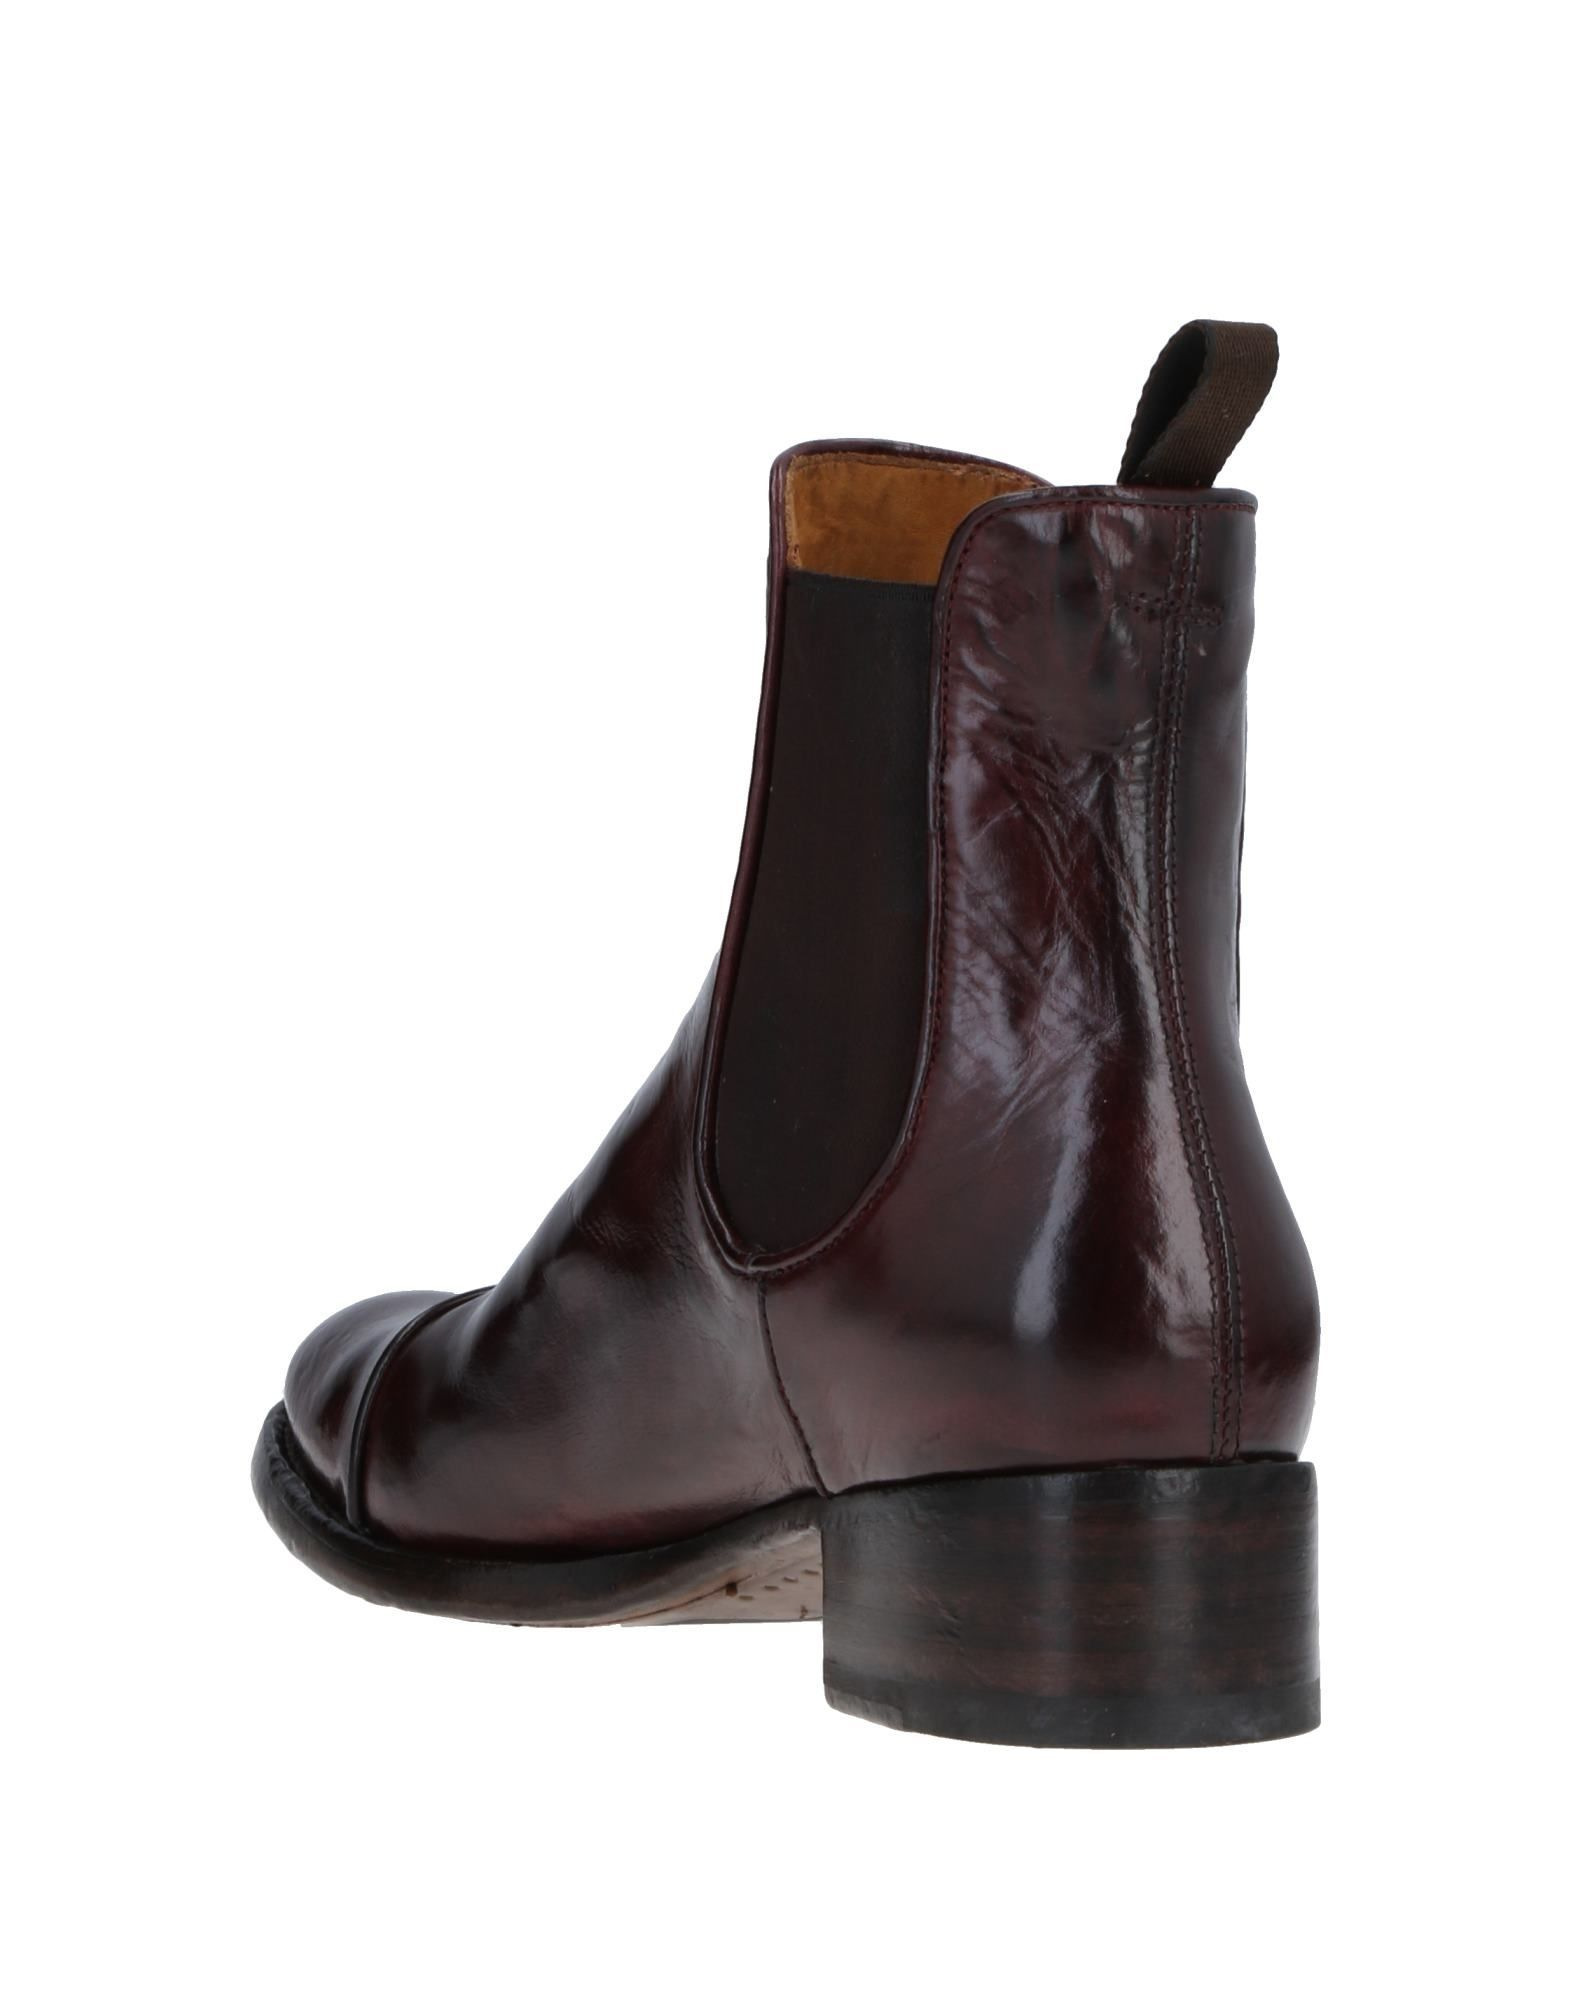 Officine Creative Italia Maroon Polished Leather Ankle Boots